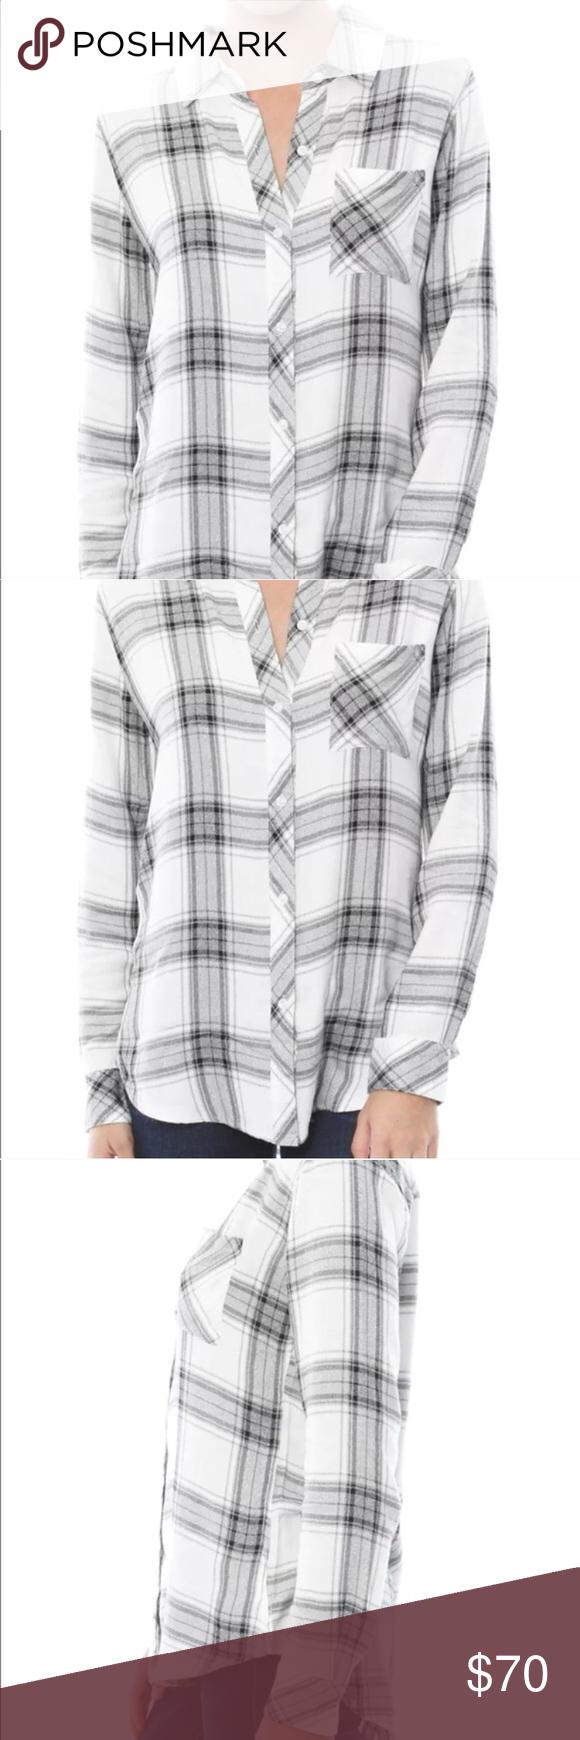 Flannel shirt xs  Rails Hunter Plaid Shirt in WhiteAsh Gray XS